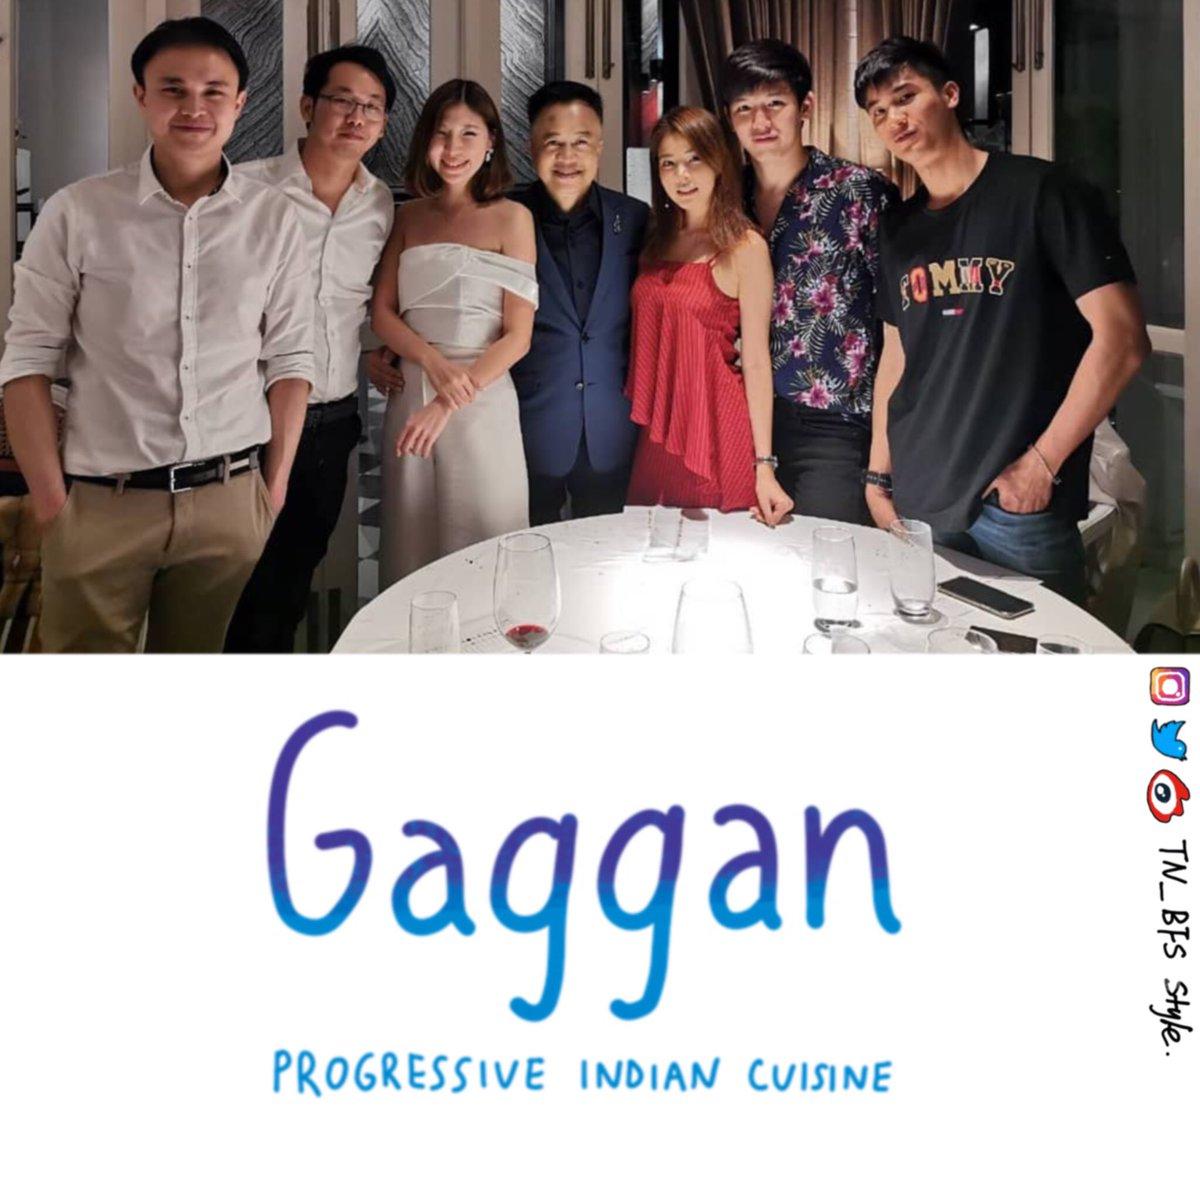 "20190424   TayNew-""a wonderful night in Gaggan"" PIC: @sananthachatth   #เตนิว   #TayNew #โพก้า #Newwiee #ฮันนี่ #Tawan_V #ชาวบ้าน #taynewfashionstyle<br>http://pic.twitter.com/qn1xssRu4P"